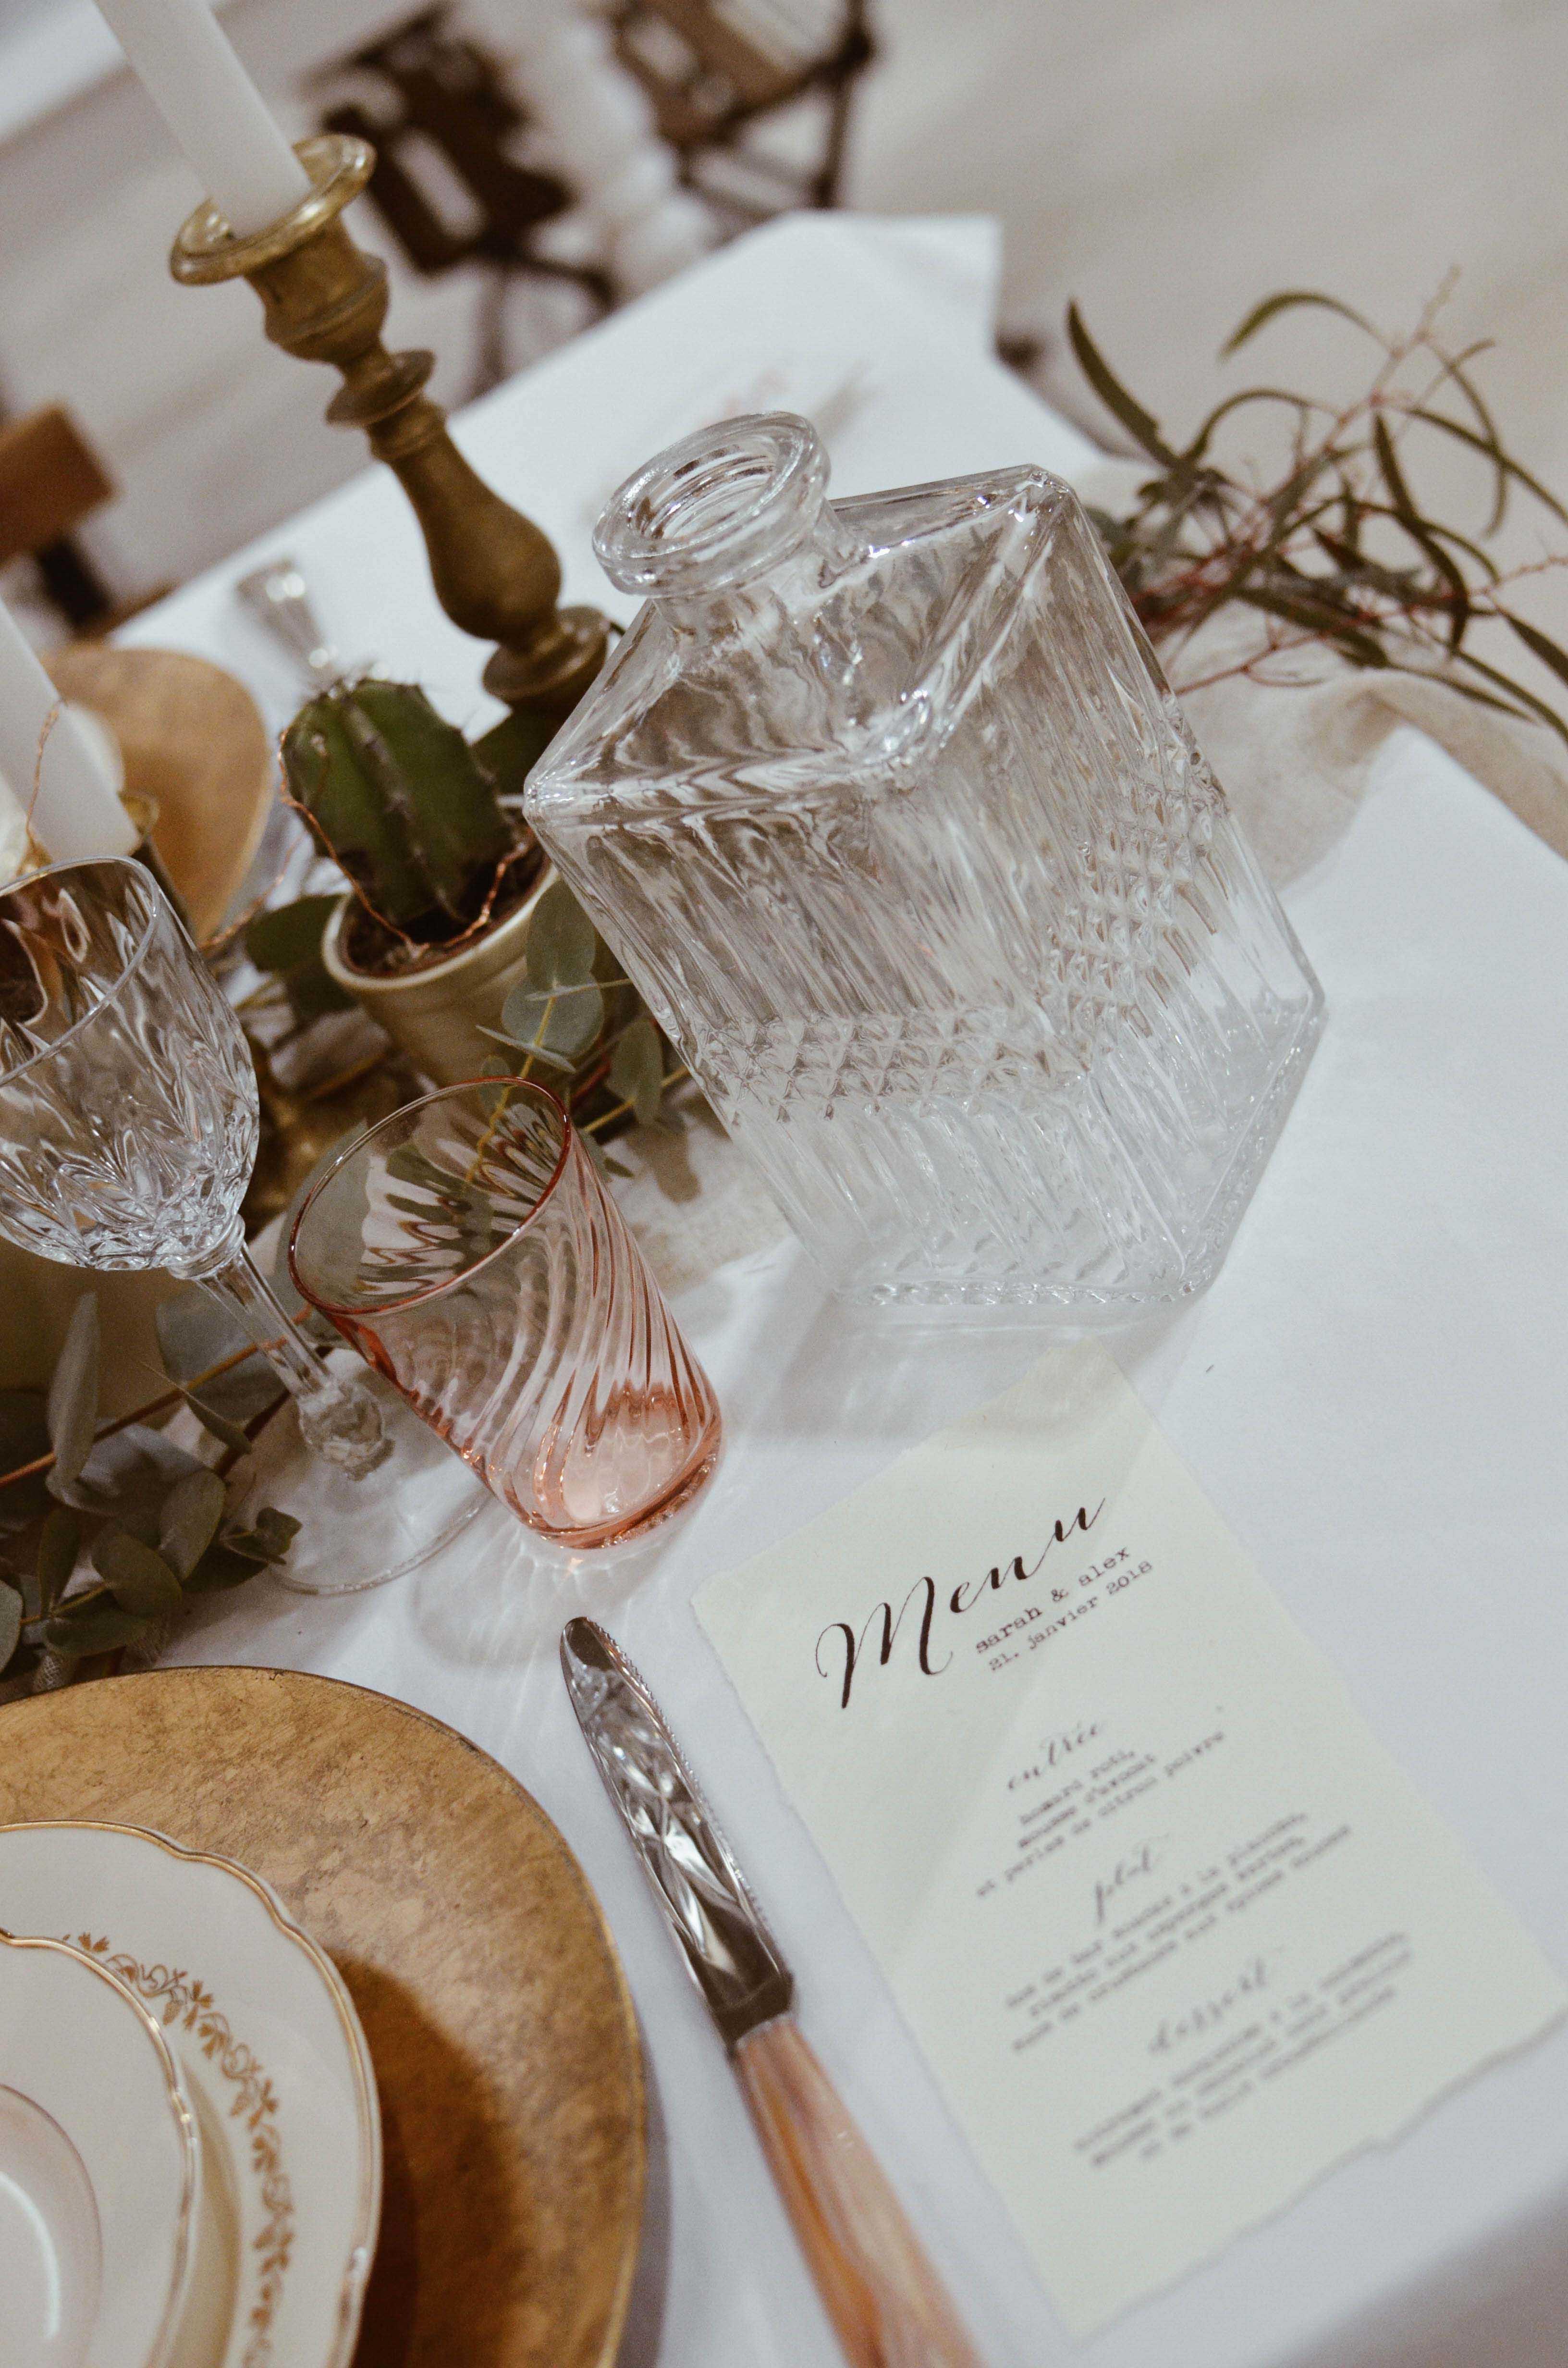 atelier-des-maries-3-la-rocehlle-decoration-de-table-de-mariage-menu